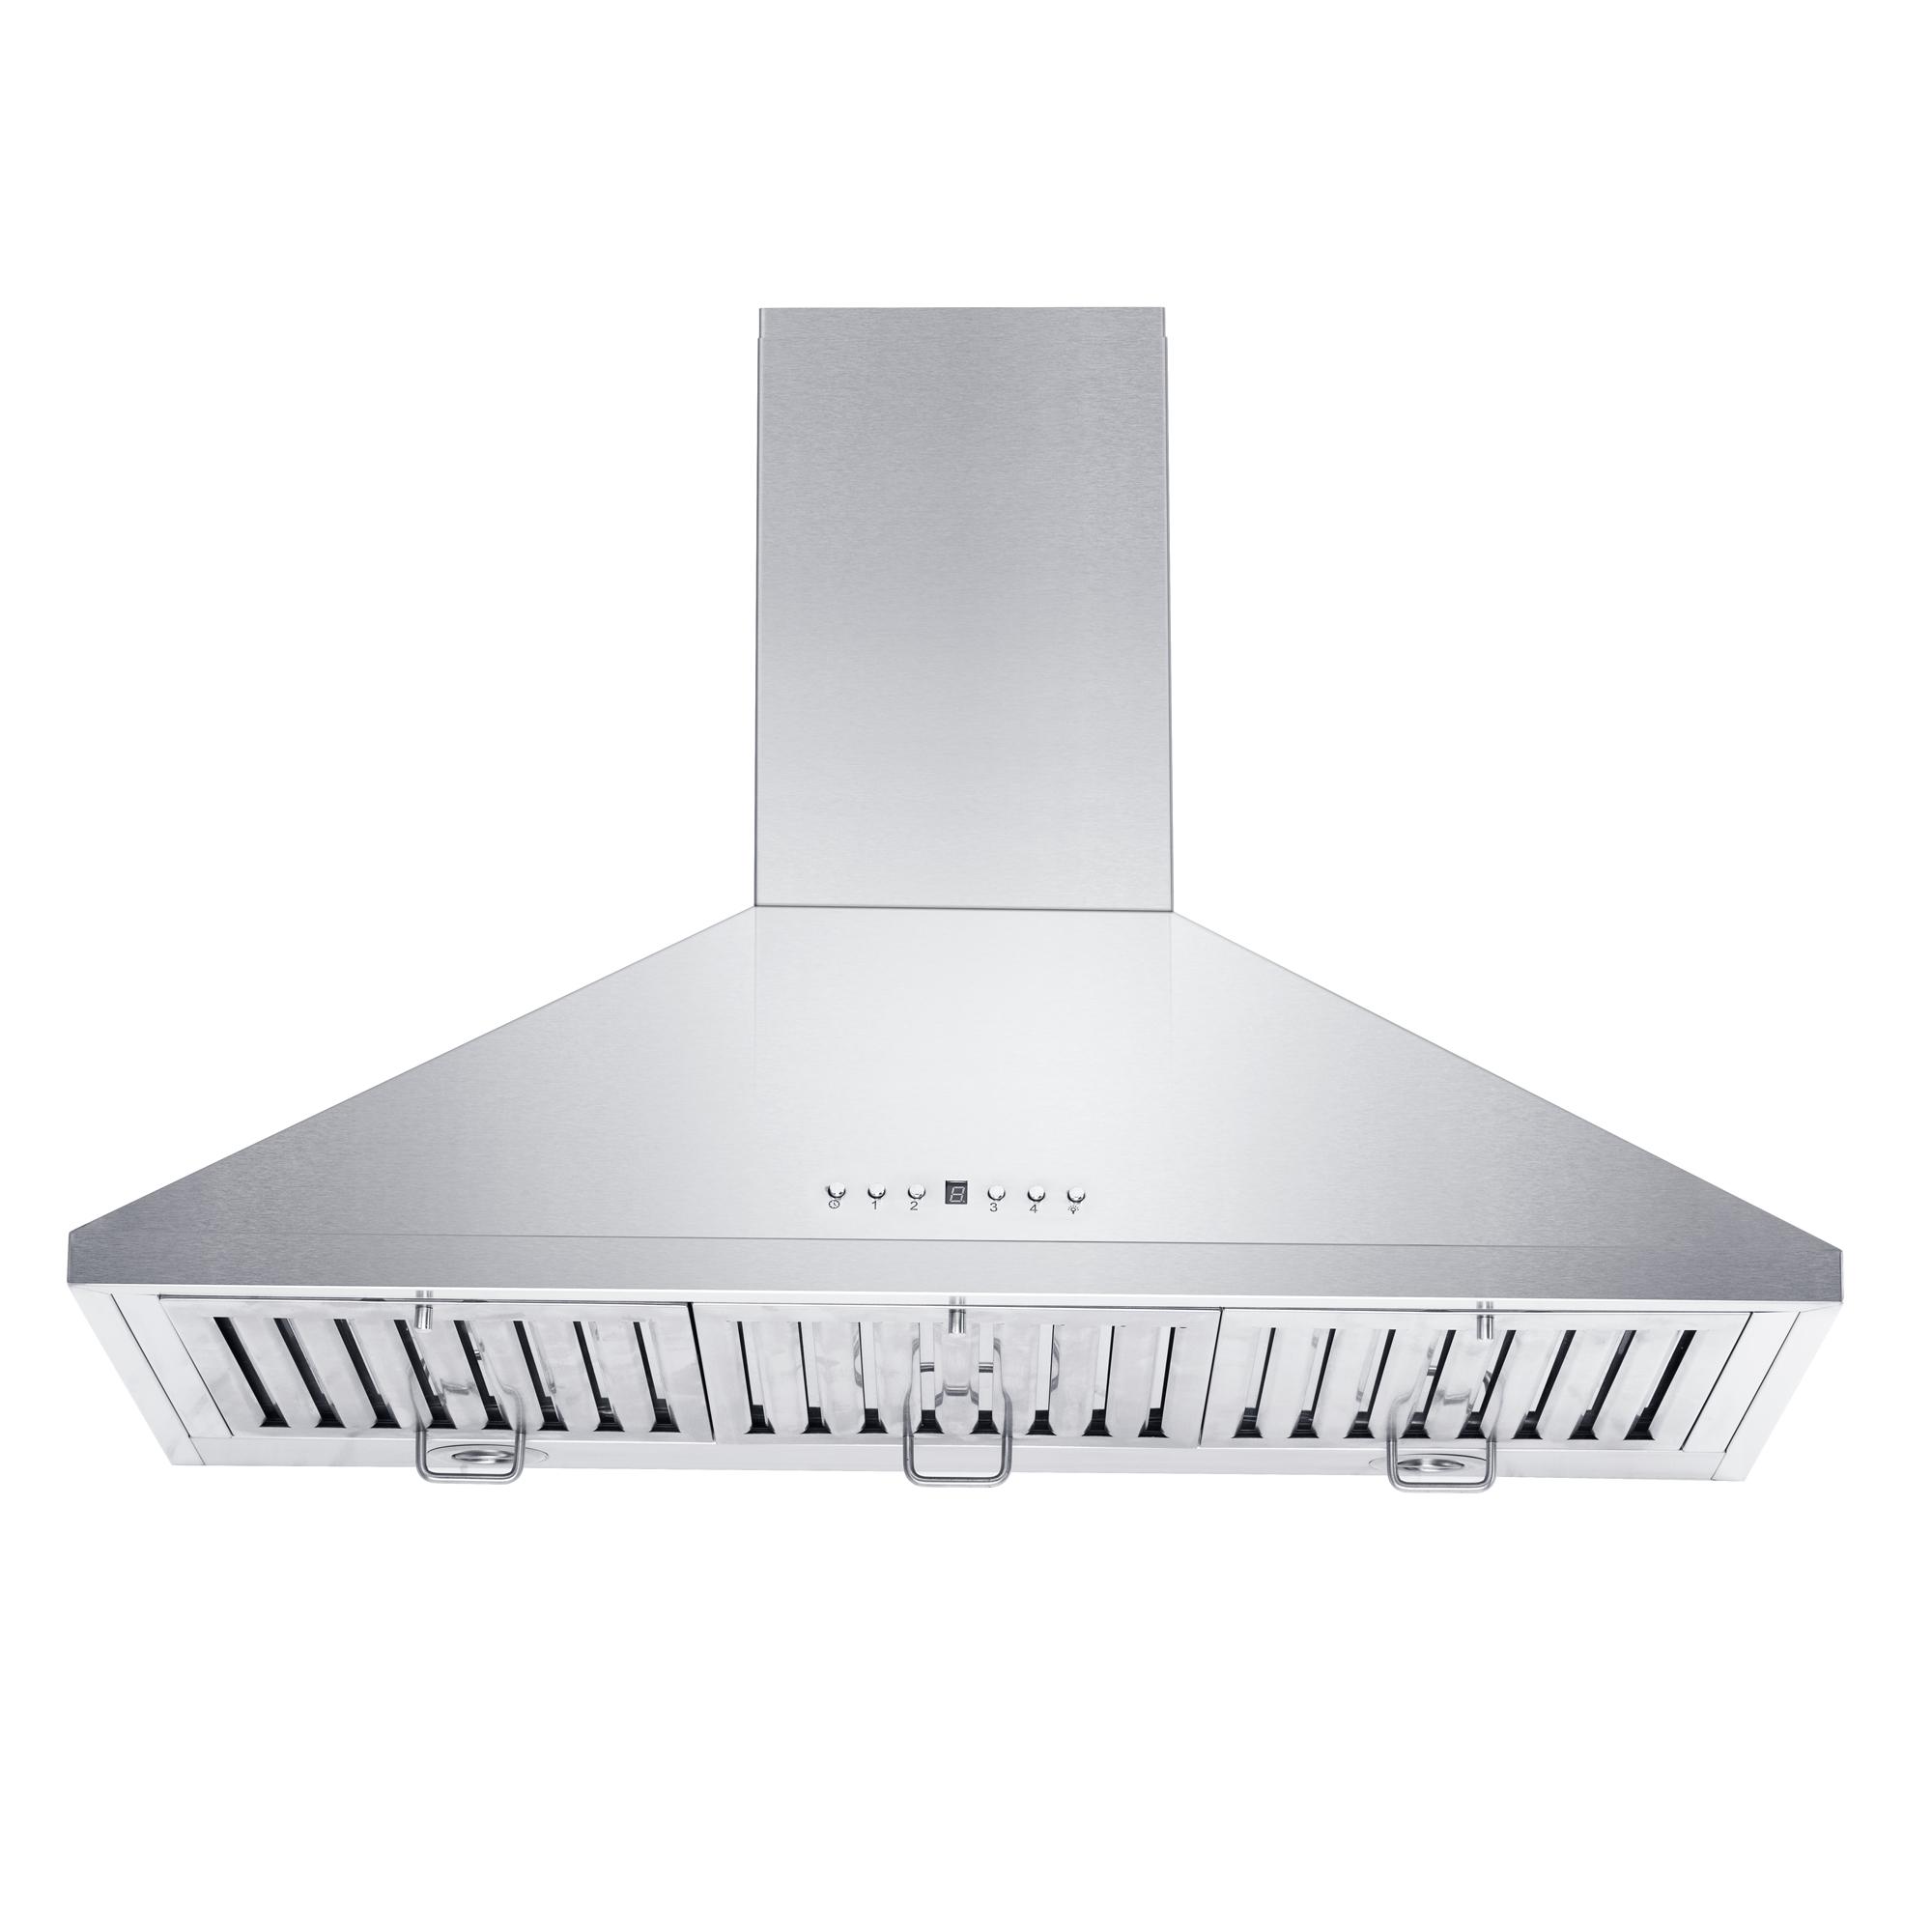 zline-stainless-steel-wall-mounted-range-hood-KL2-new-under.jpg